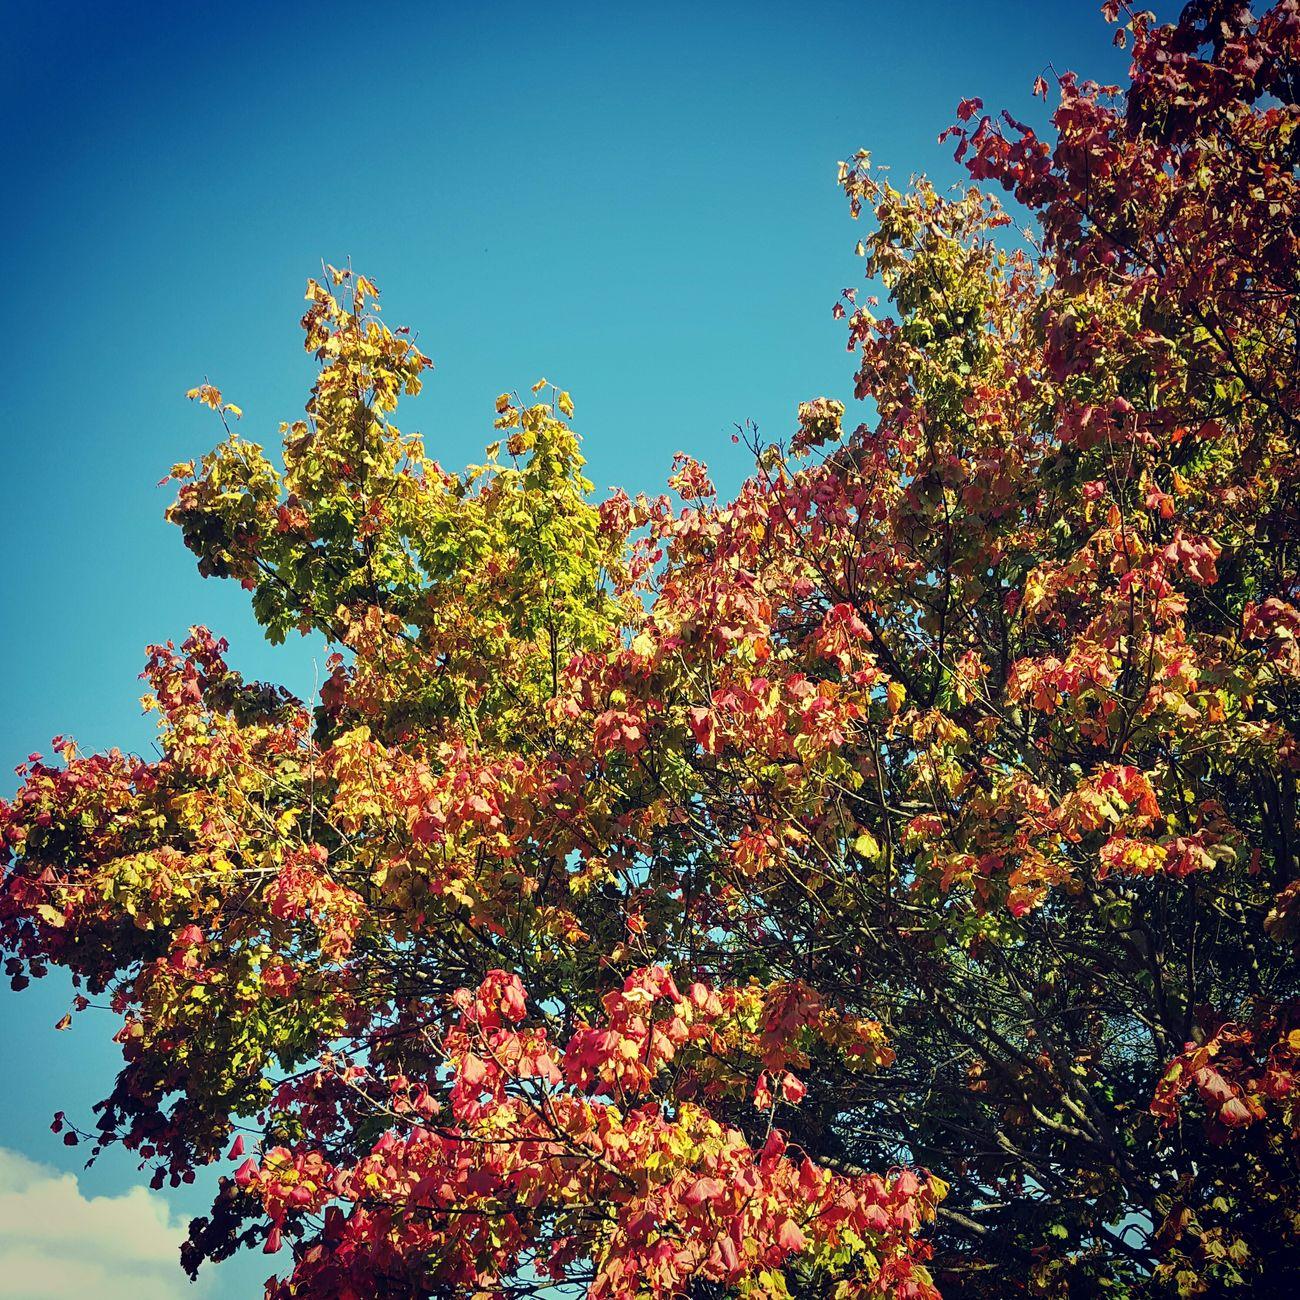 Fall Beauty Autumn Colors Changing Seasons